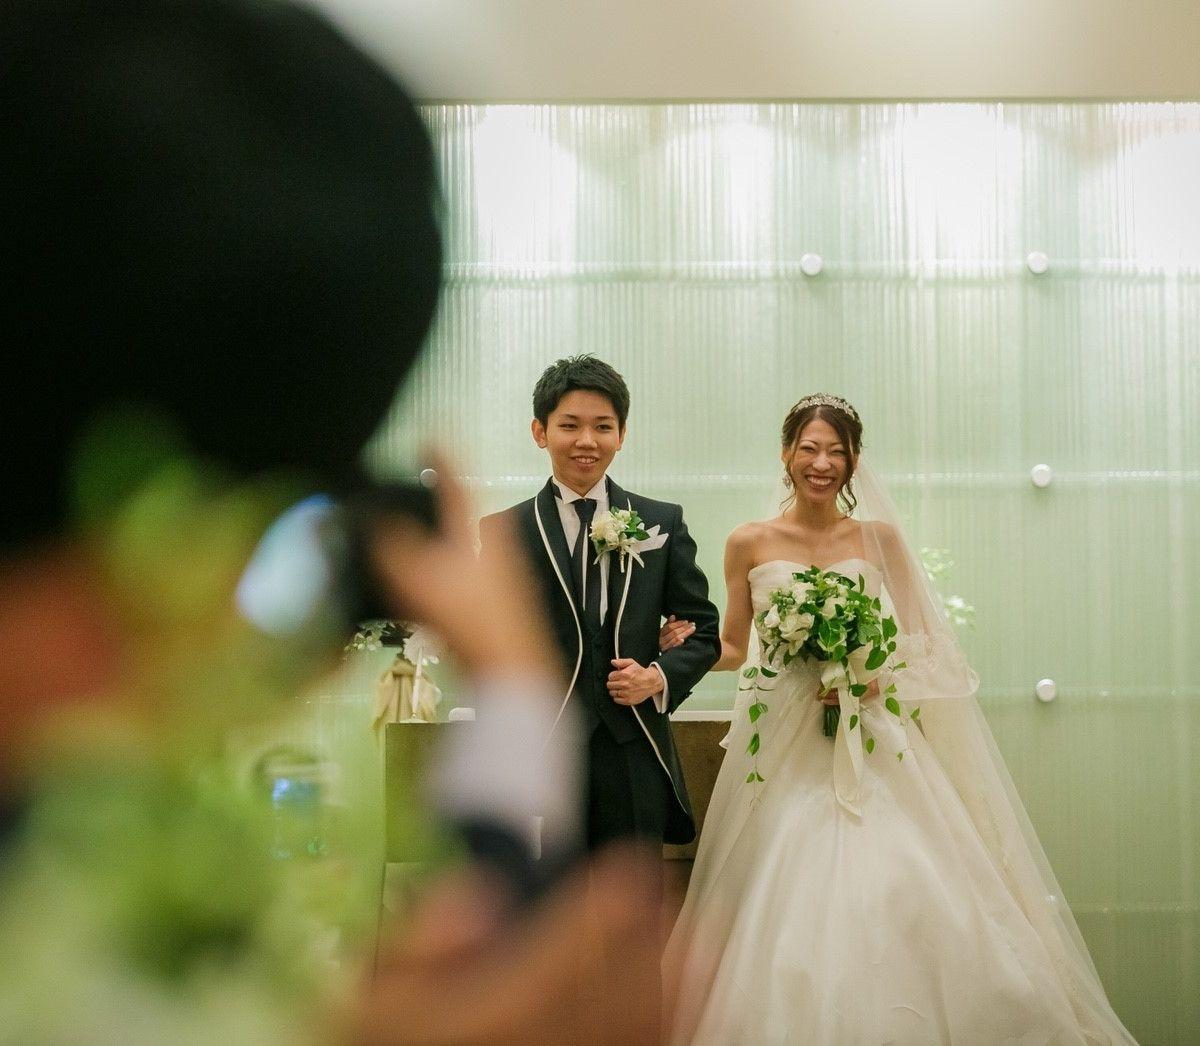 km0714.weddingさんのホテル グランミラージュ写真1枚目